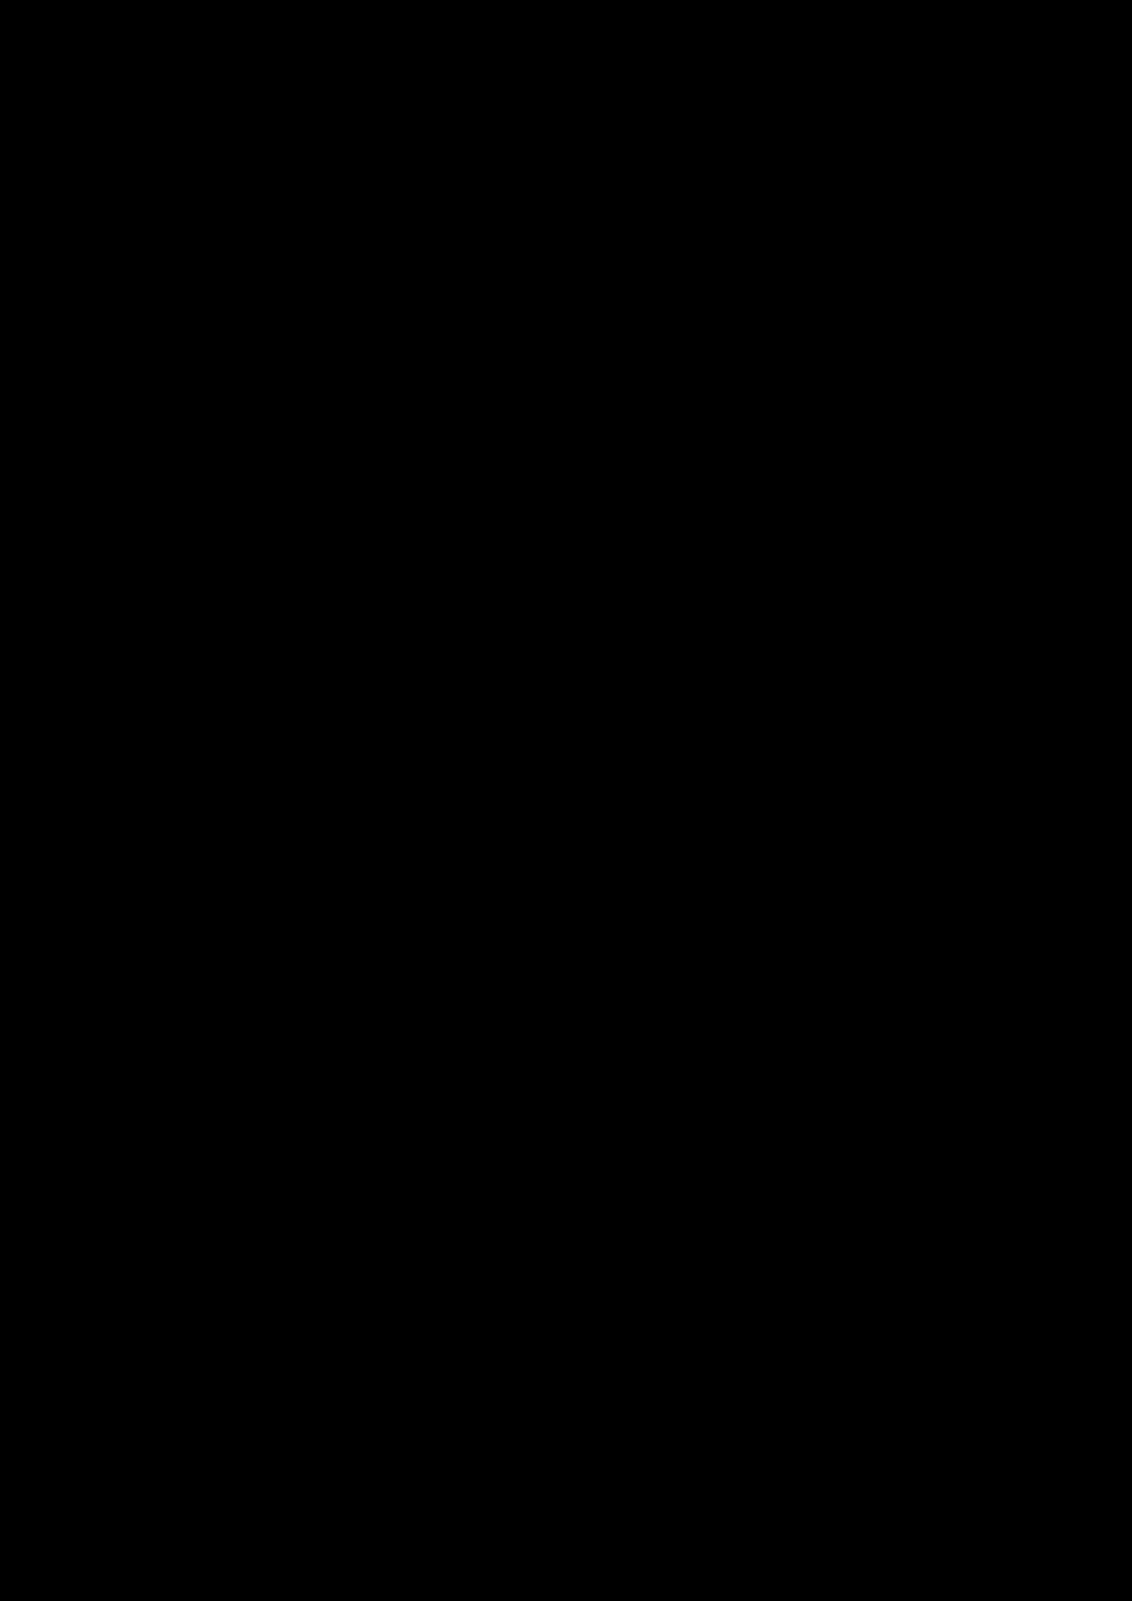 Korolevstvo slez slide, Image 73